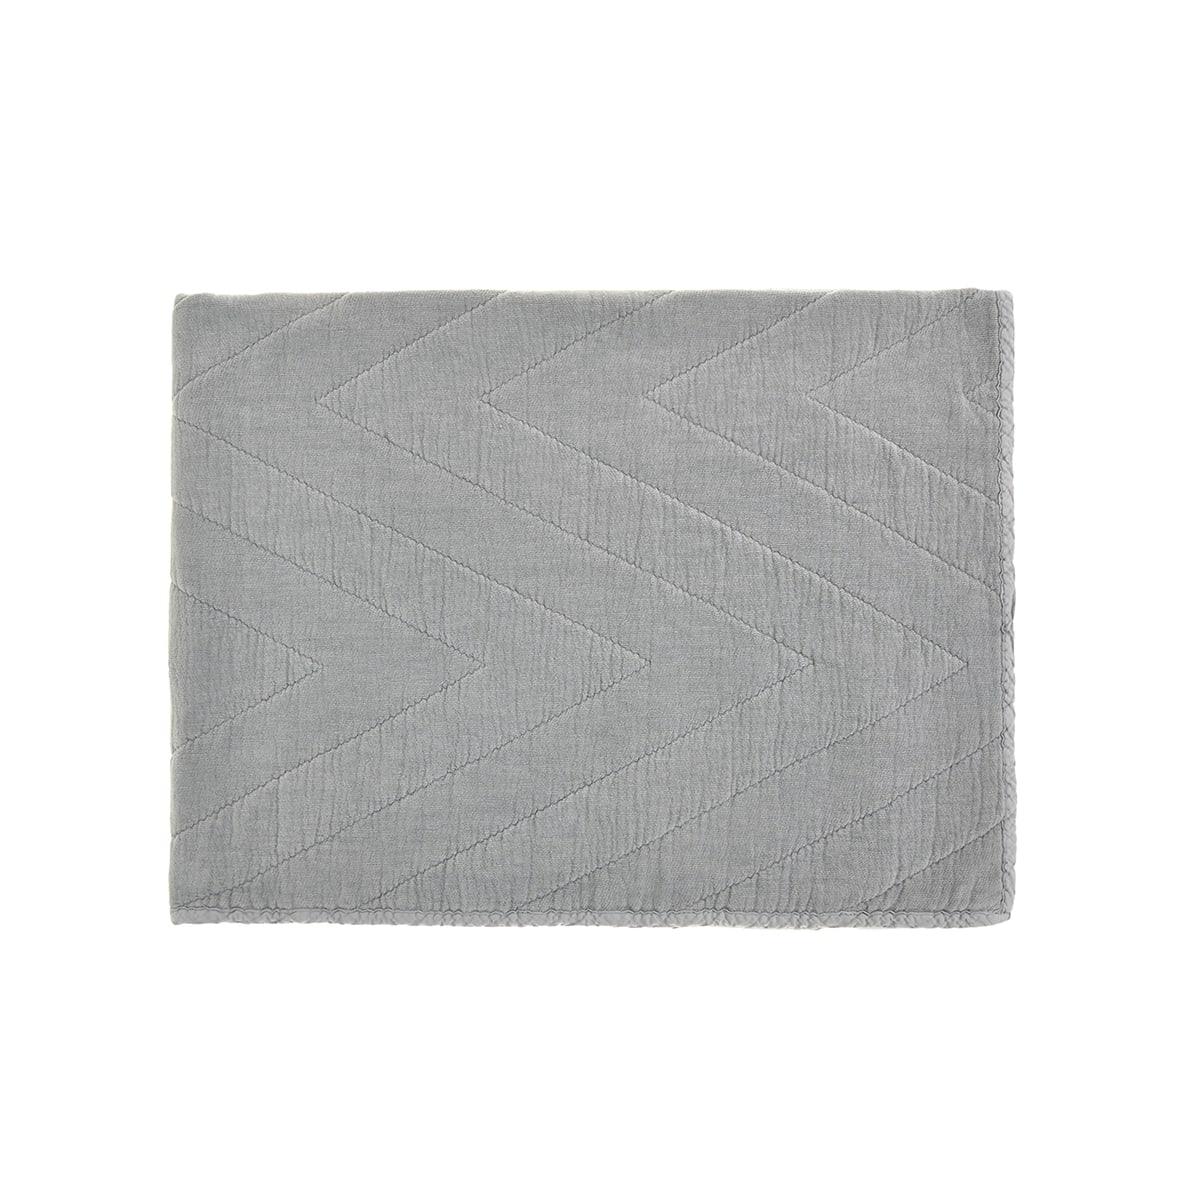 Edredon Eugenie Ciment Grey